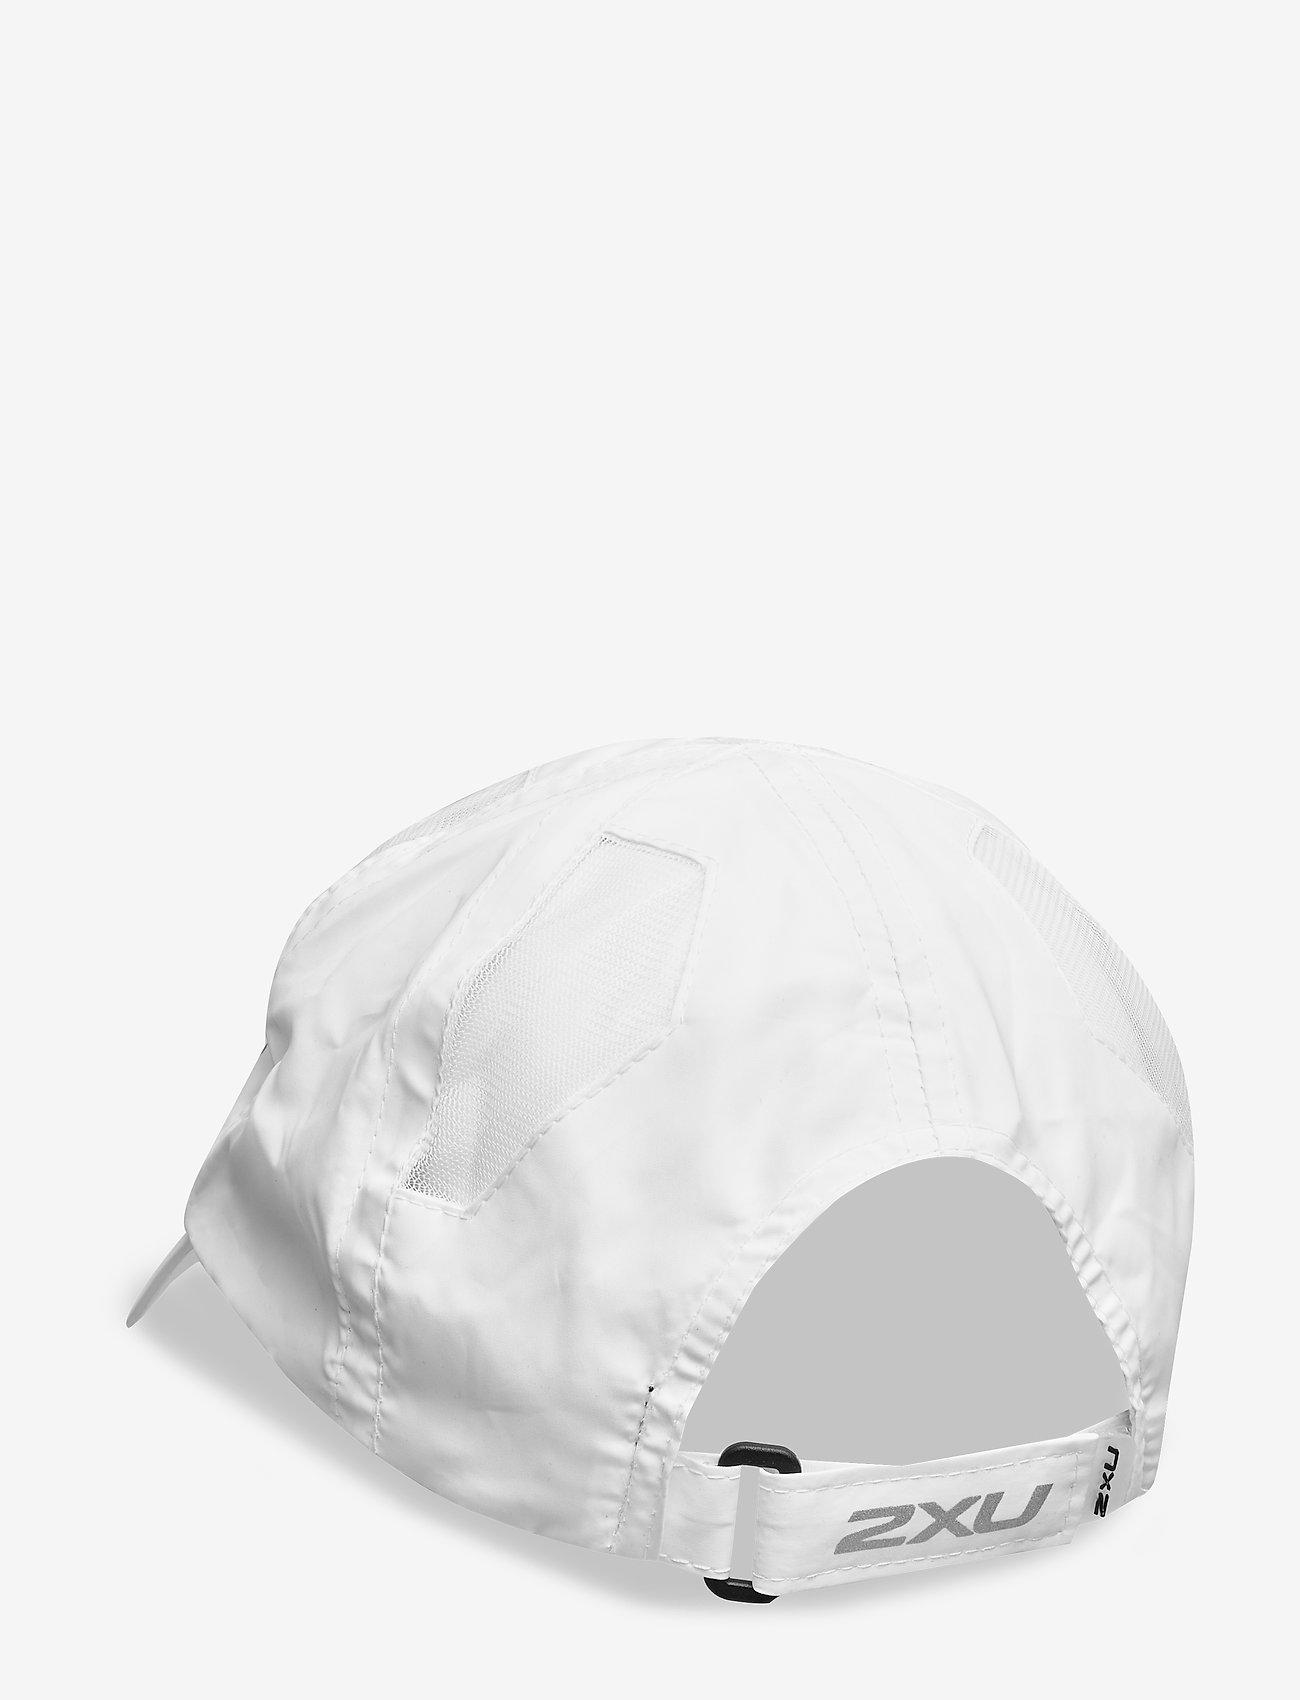 2XU - RUN CAP - petten - white/white - 1